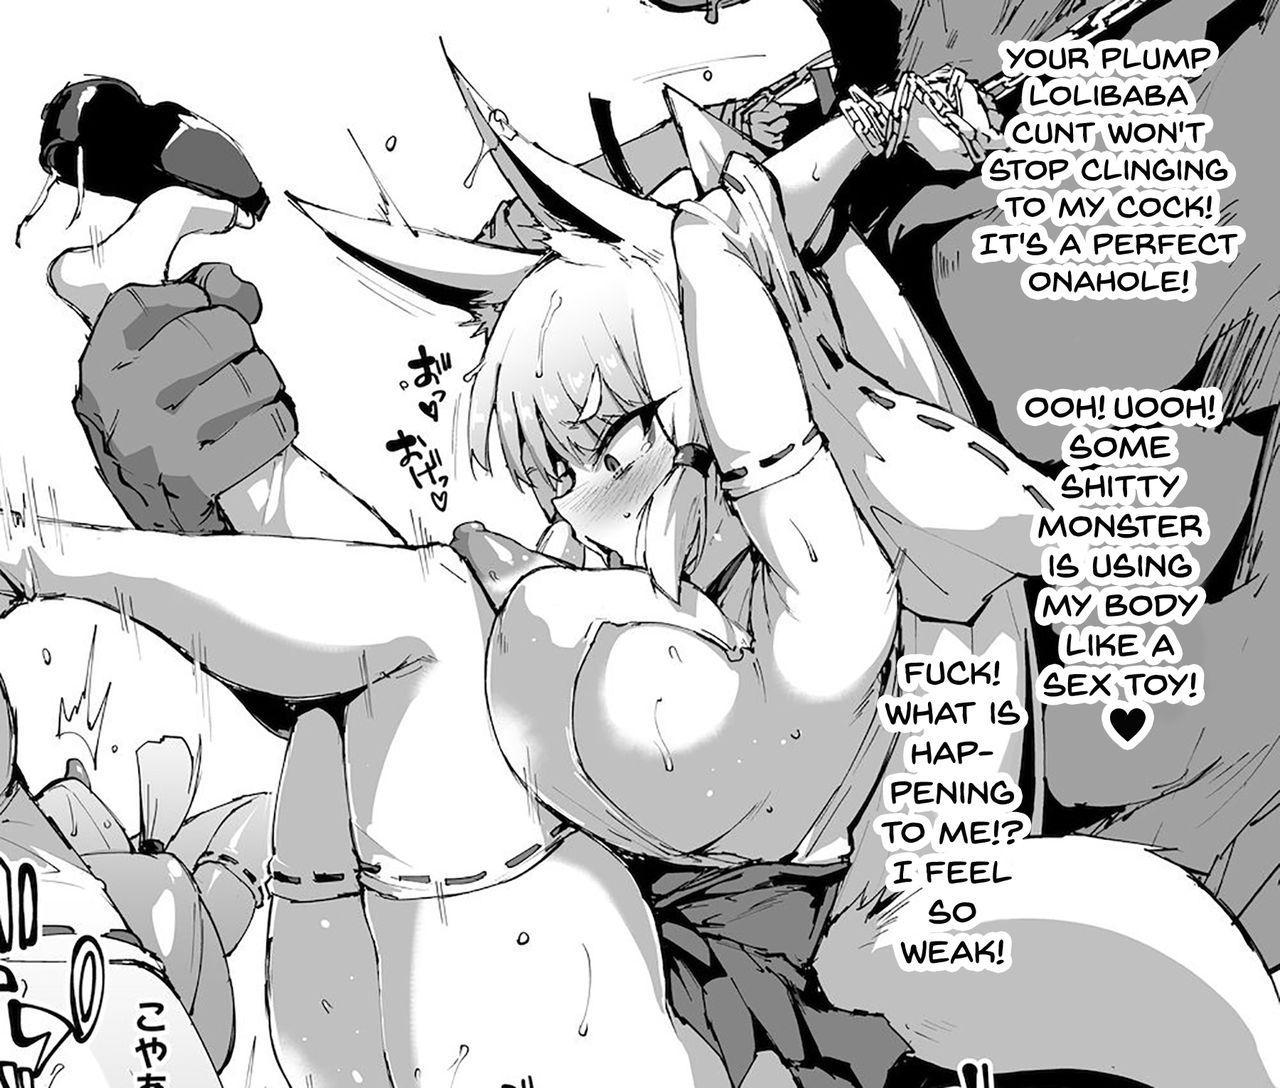 Kurokami Ponytail Tsurime JK Taimabu Rakugaki | Exorcism Club for Black Haired Girls with Ponytails 9